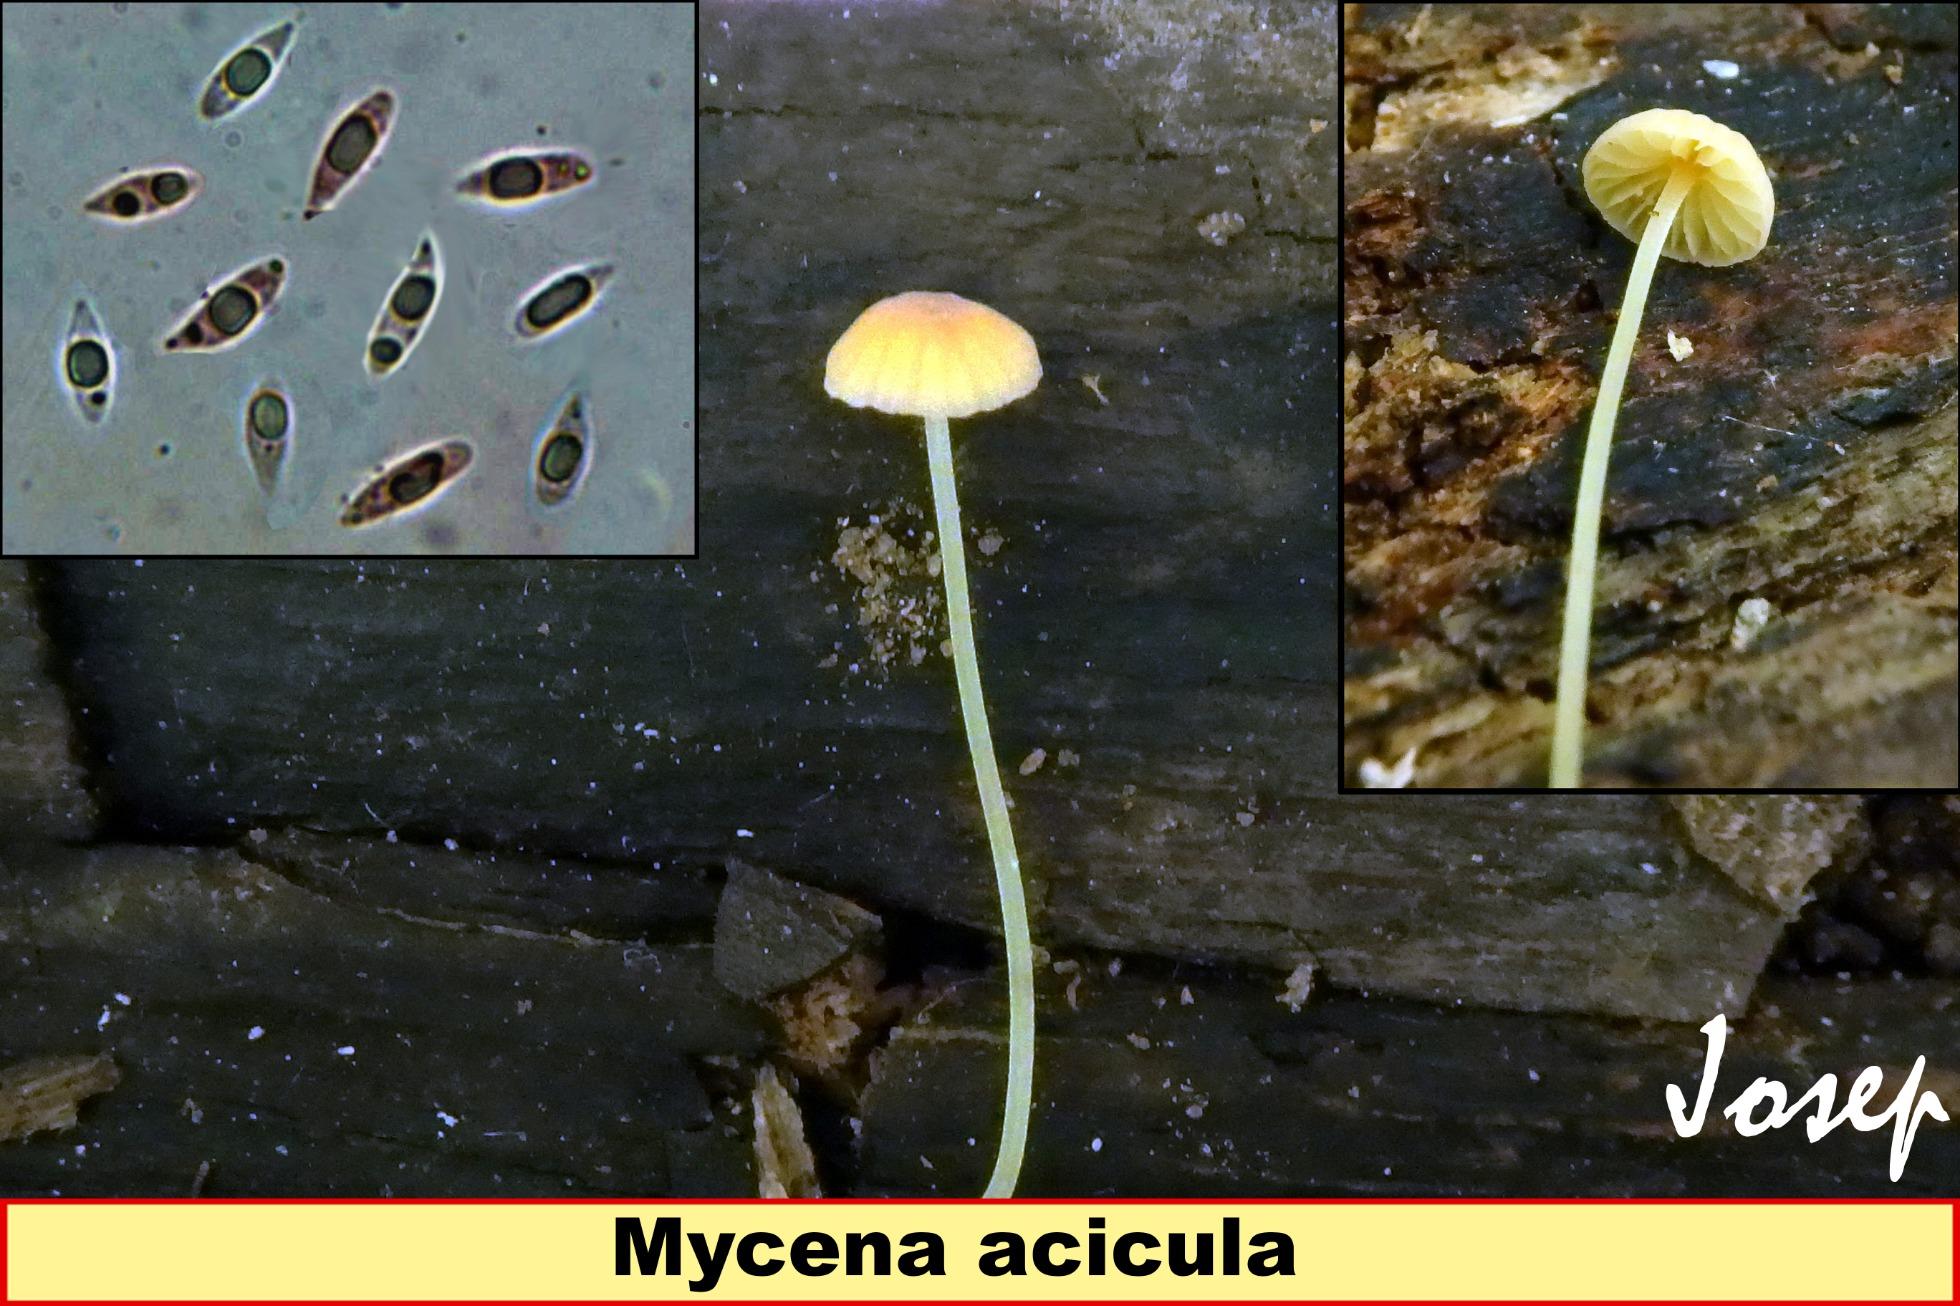 Mycenaacicula_2019-01-03.jpg